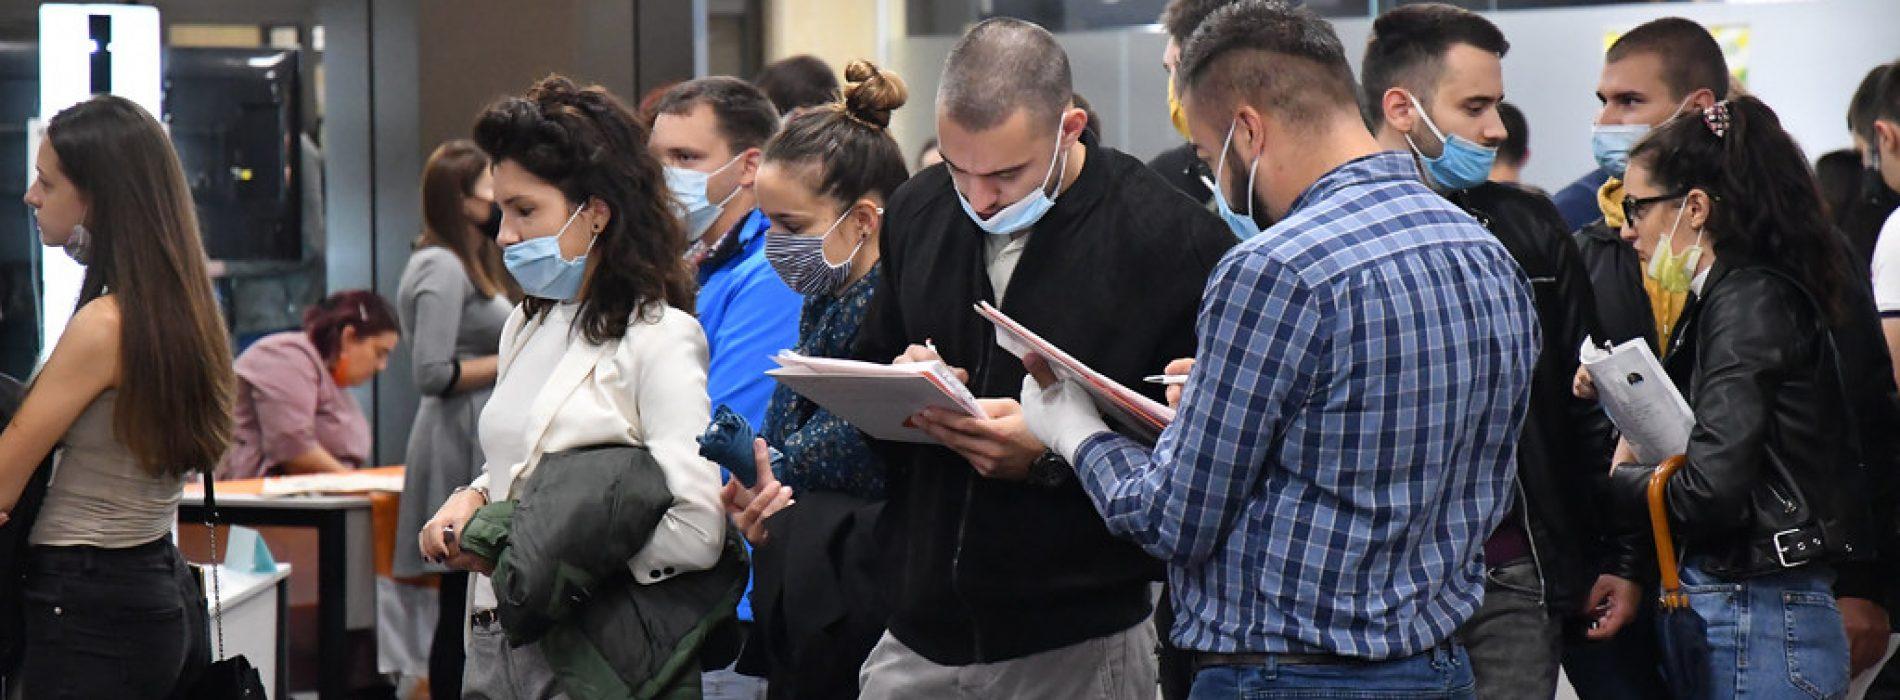 Над 2100 души проведоха интервюта за работа на Дни на кариерата – ИТ, Комуникации и Аутсорсинг